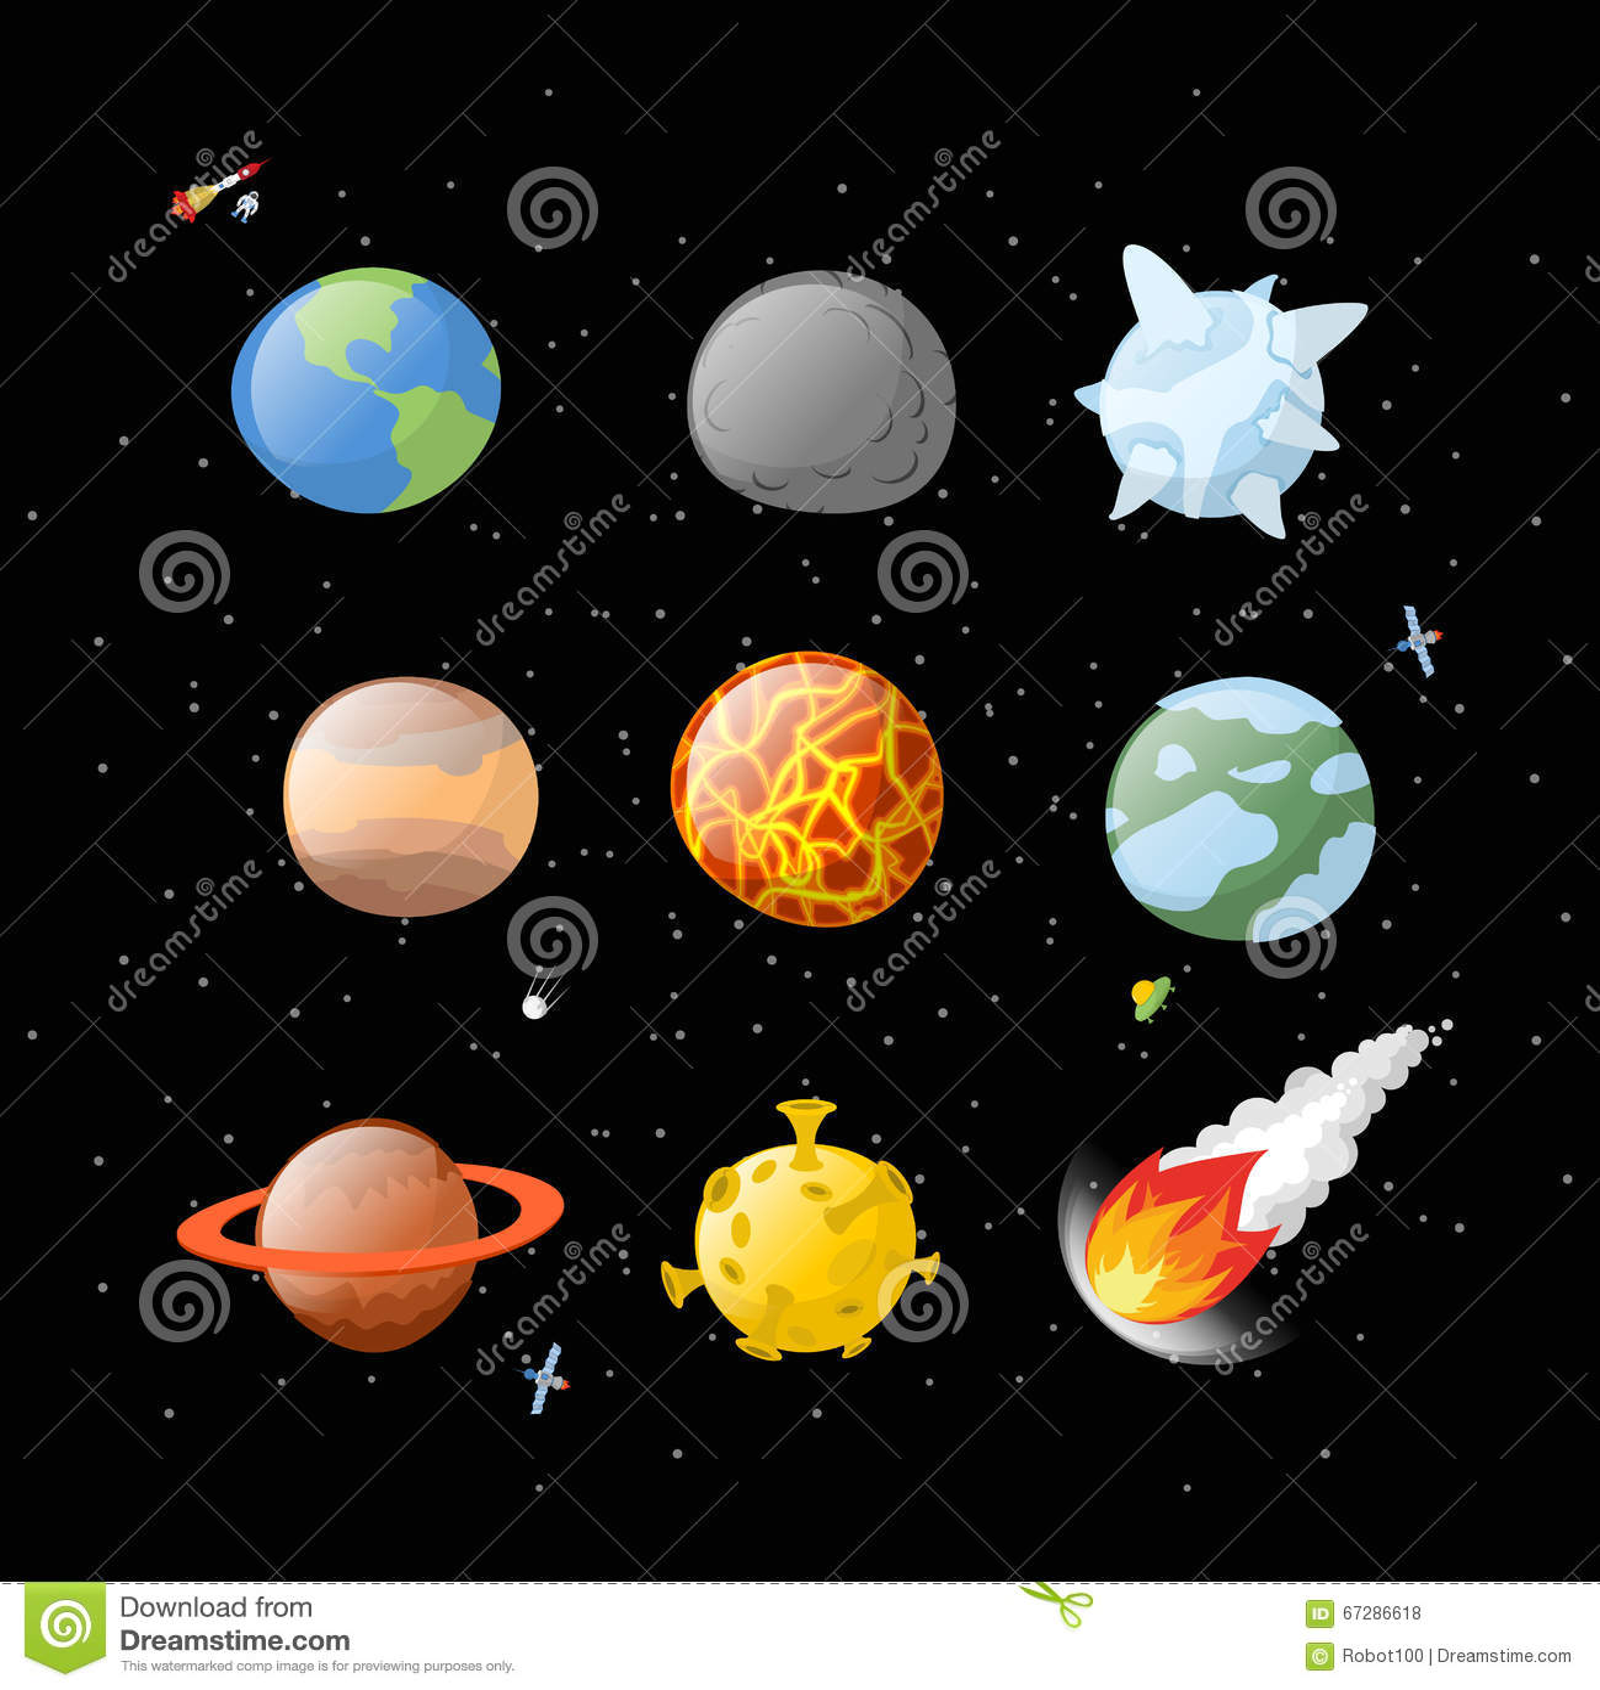 Planet set dark background. Dark space. Planets of solar system